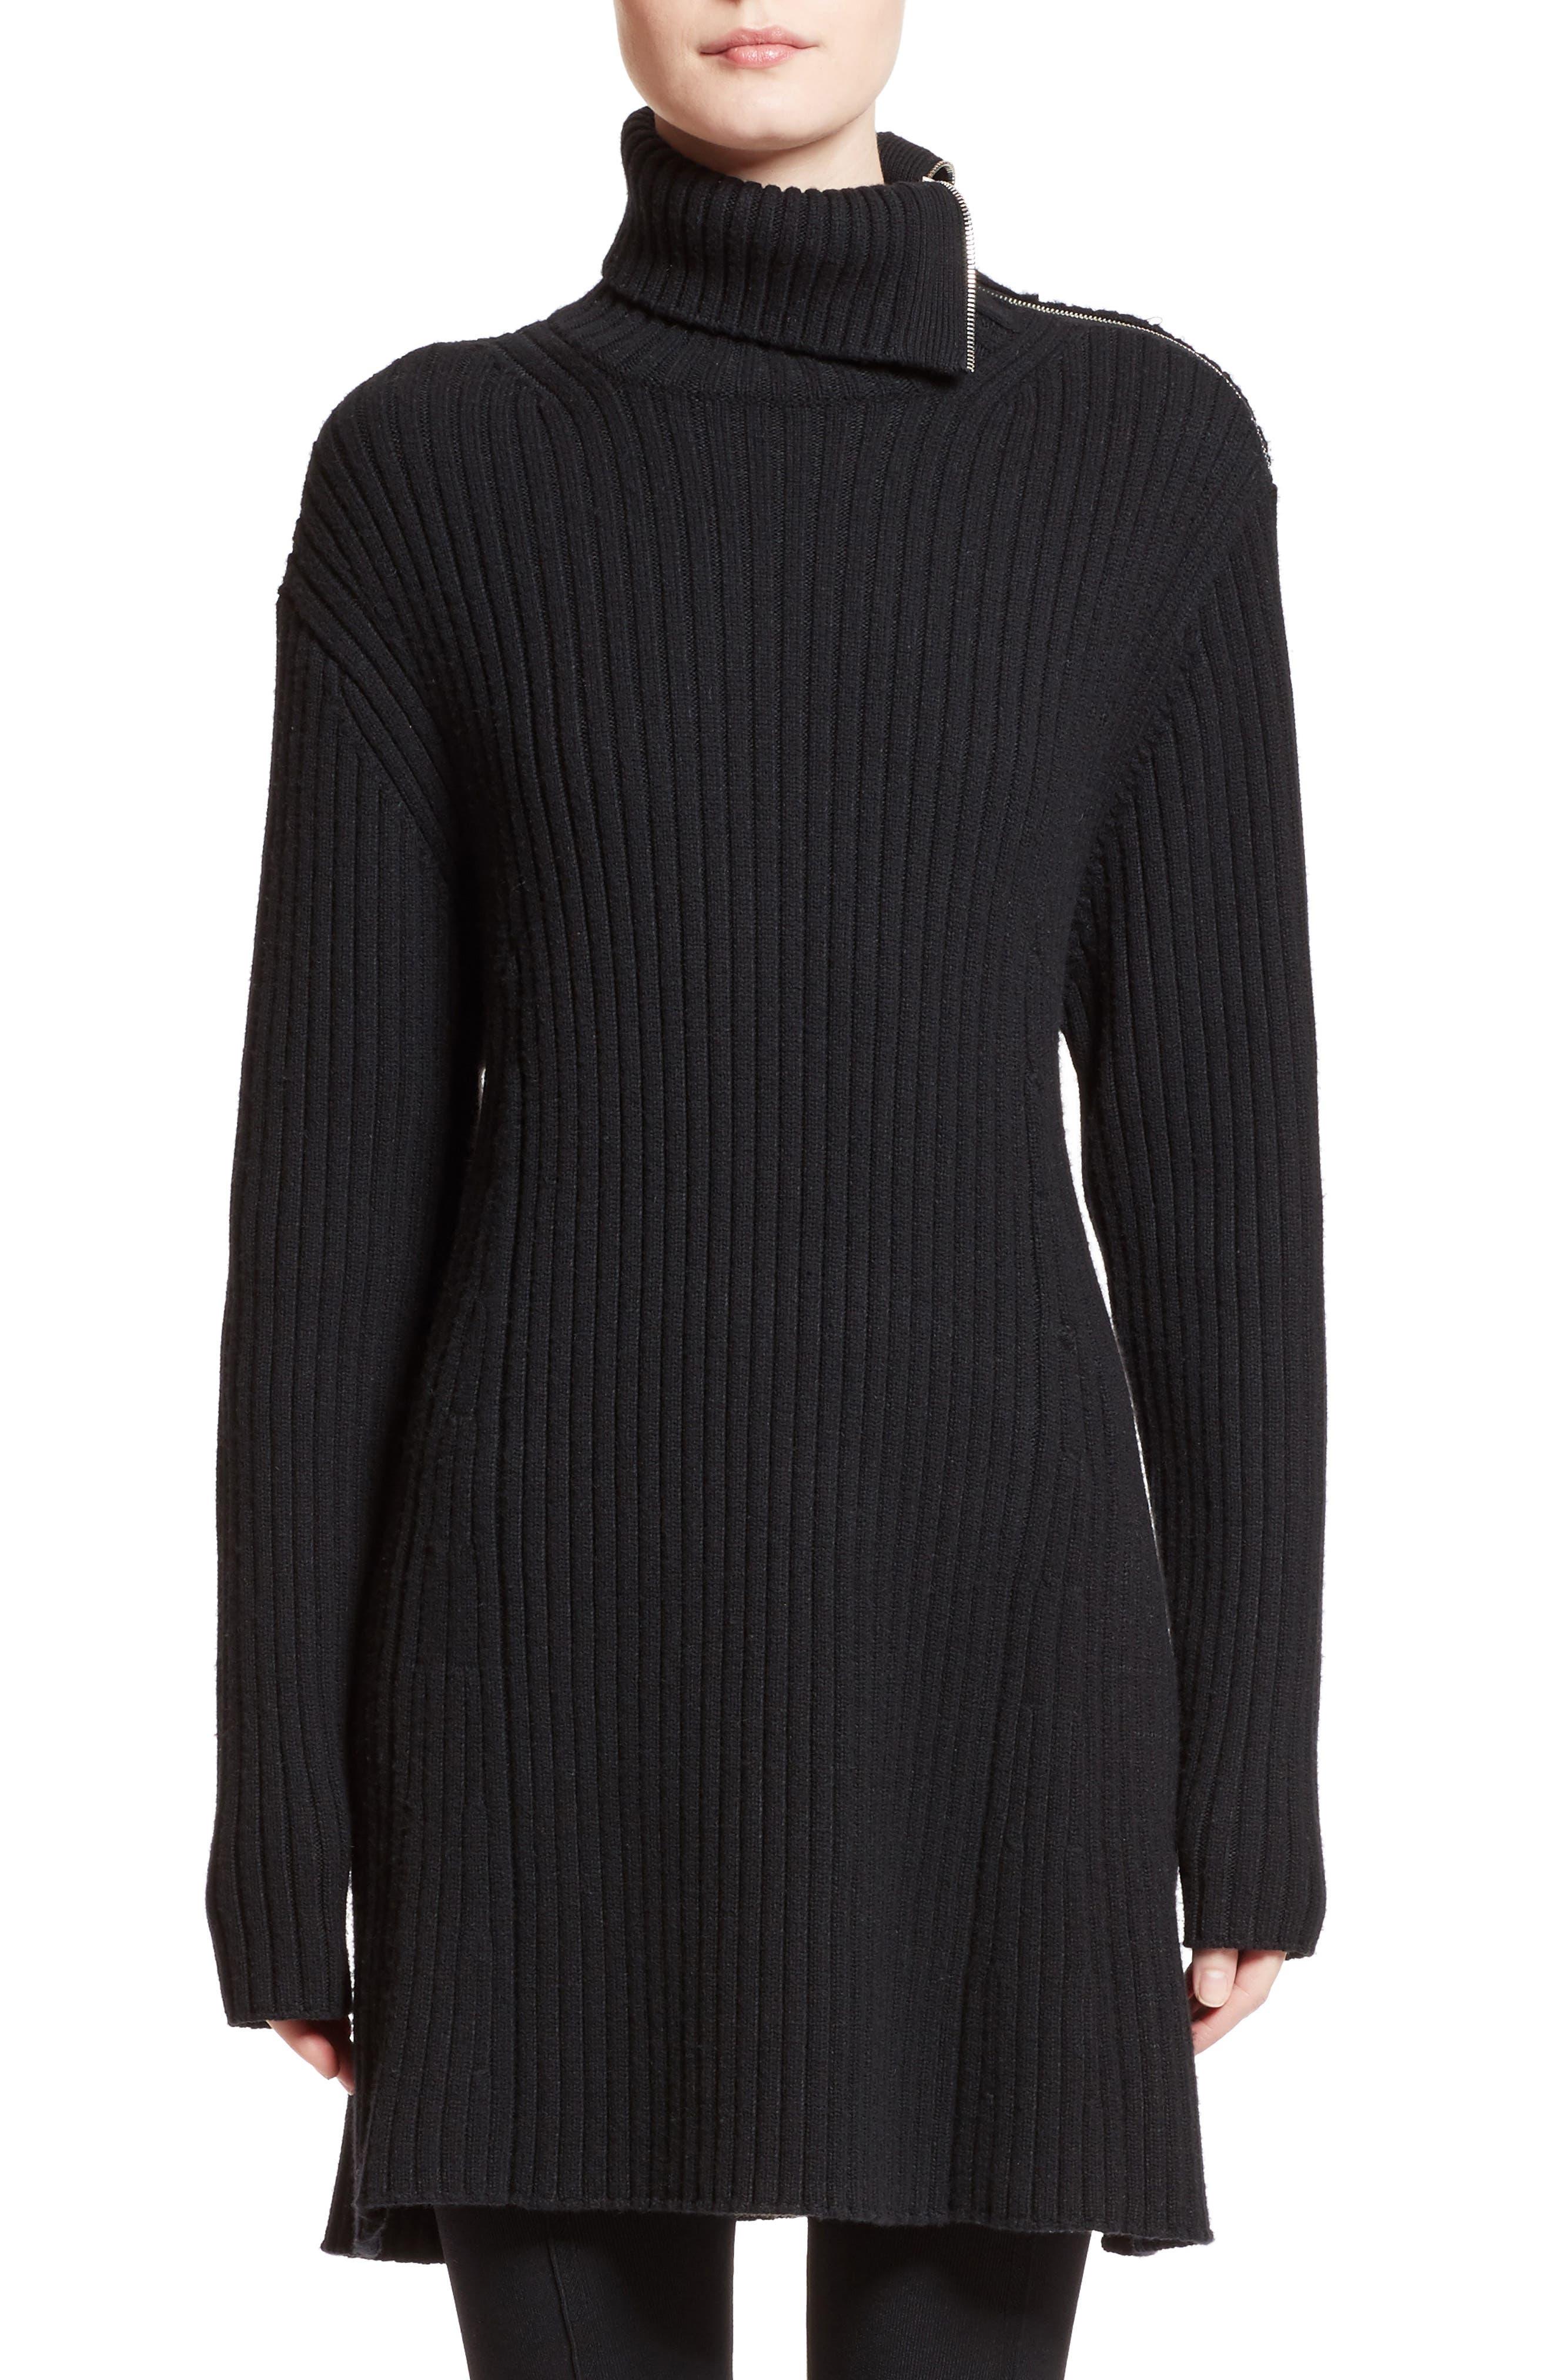 Wool & Cashmere Blend Turtleneck Dress,                             Main thumbnail 1, color,                             Black